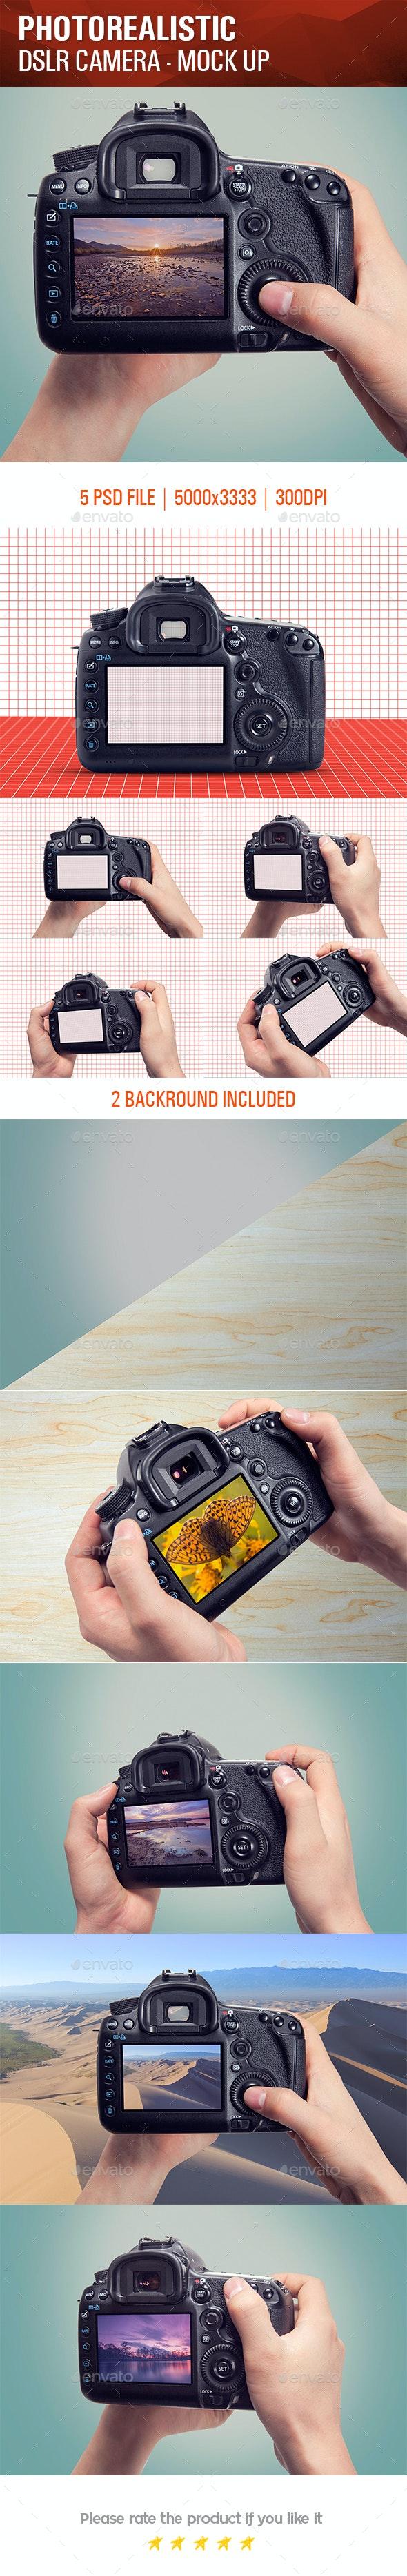 Photorealistic DSLR Camera Mock Up - Product Mock-Ups Graphics